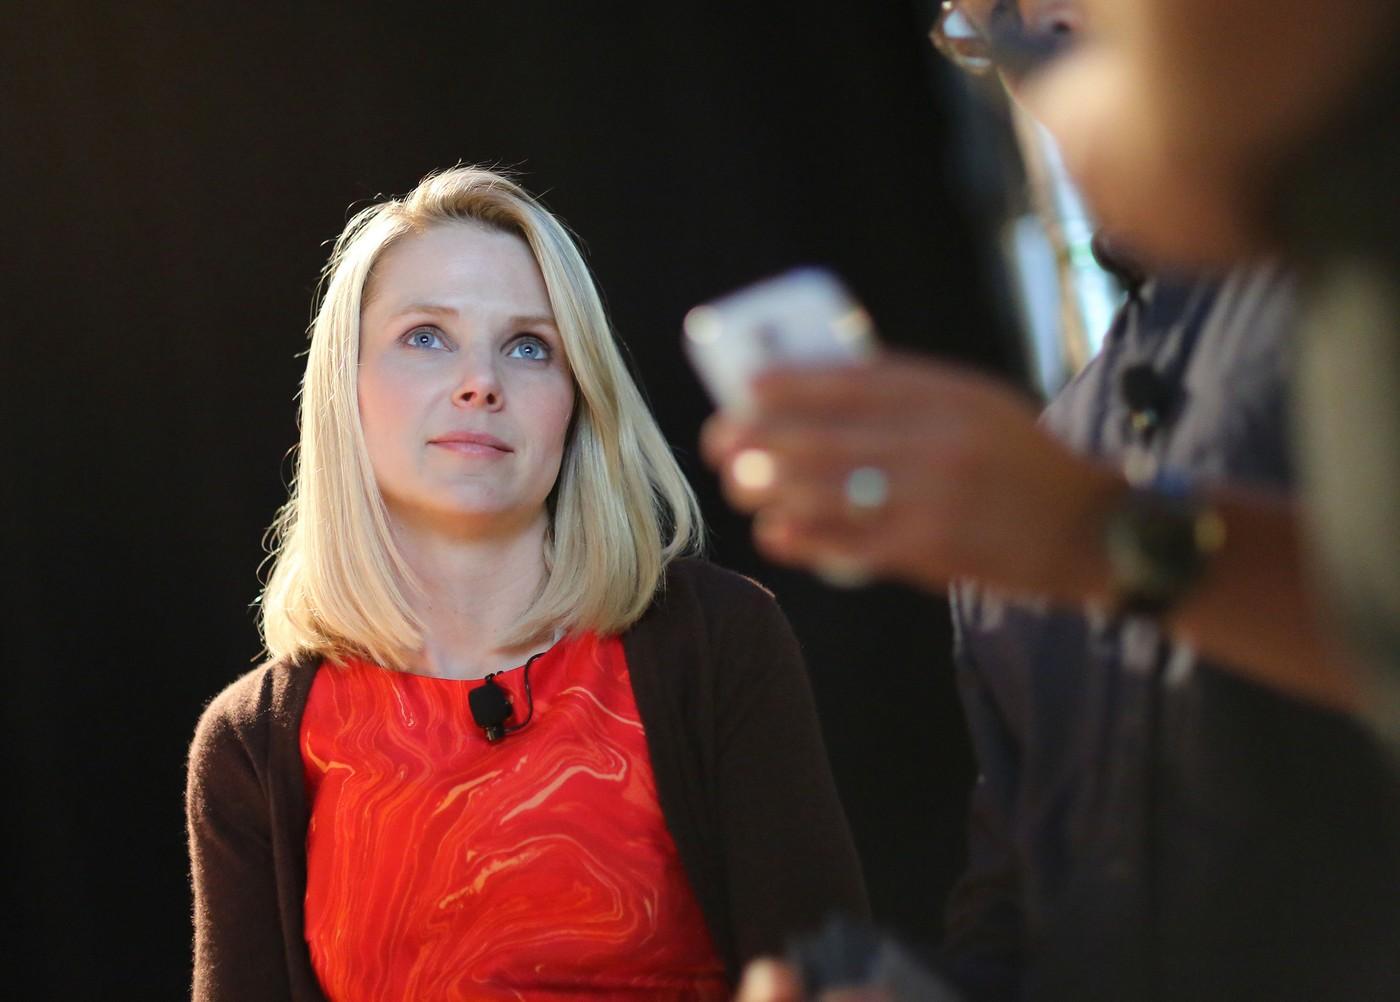 Yahoo出售交易或因用戶資料洩露事件流產,賣不出去的Twitter有伴了